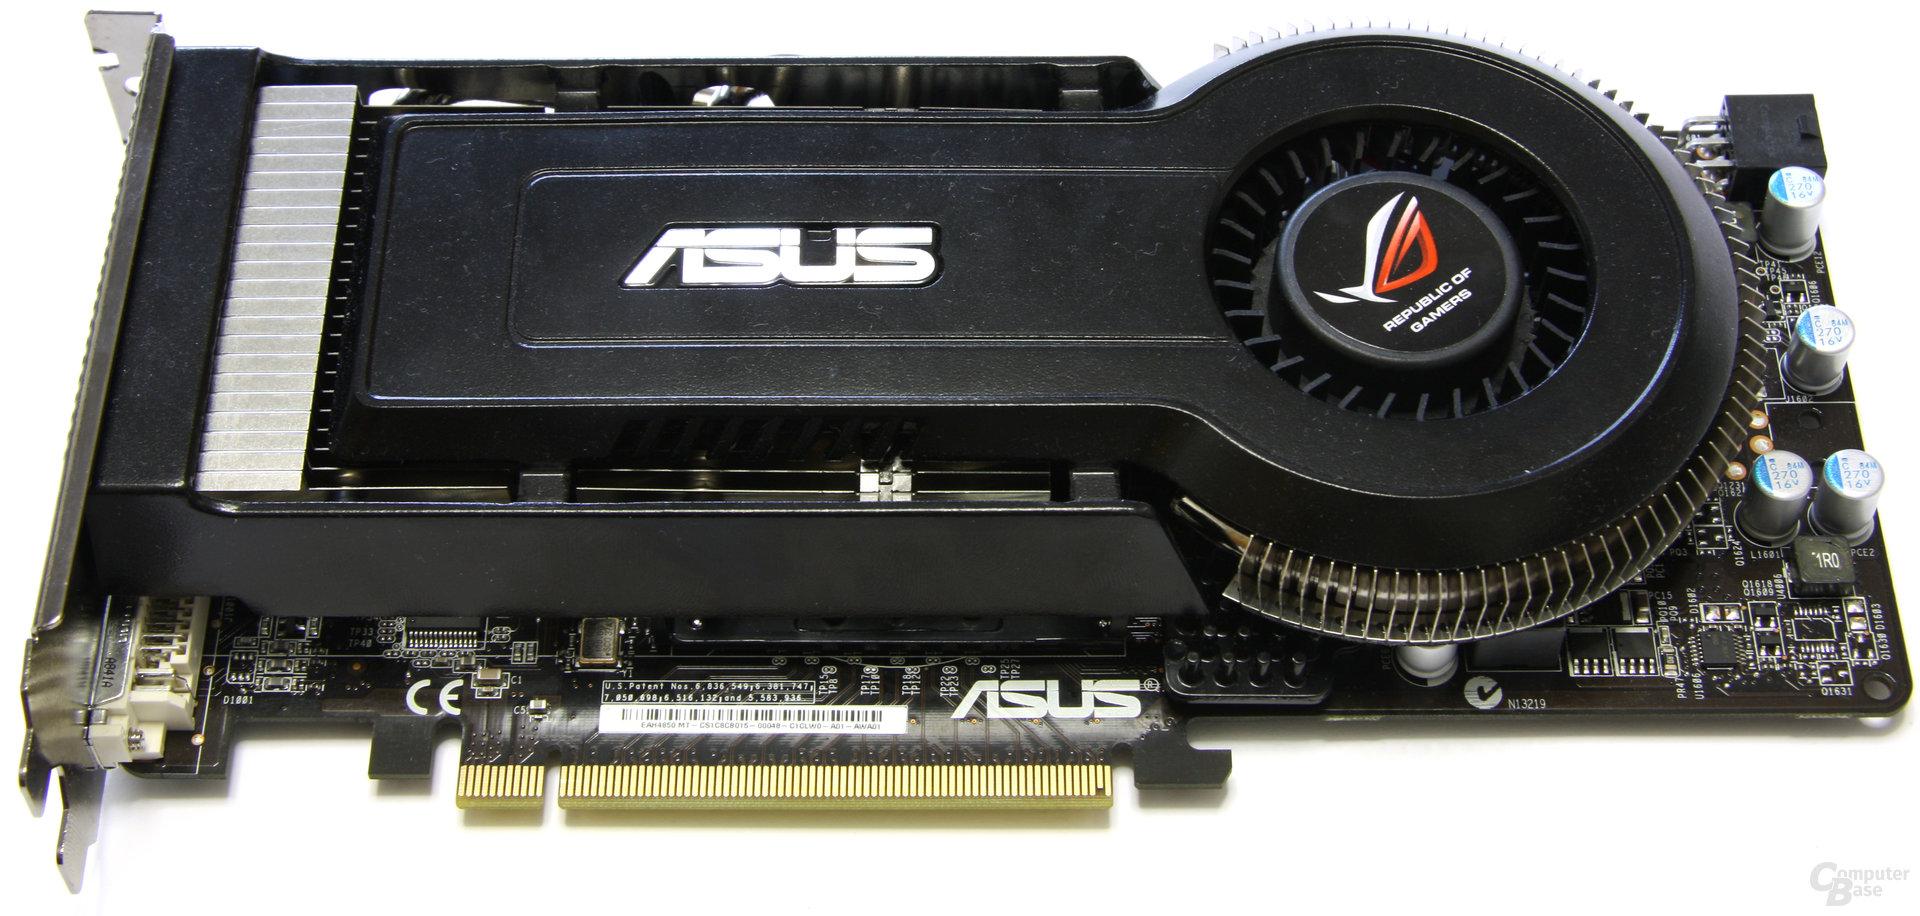 Asus Radeon HD 4850 Matrix